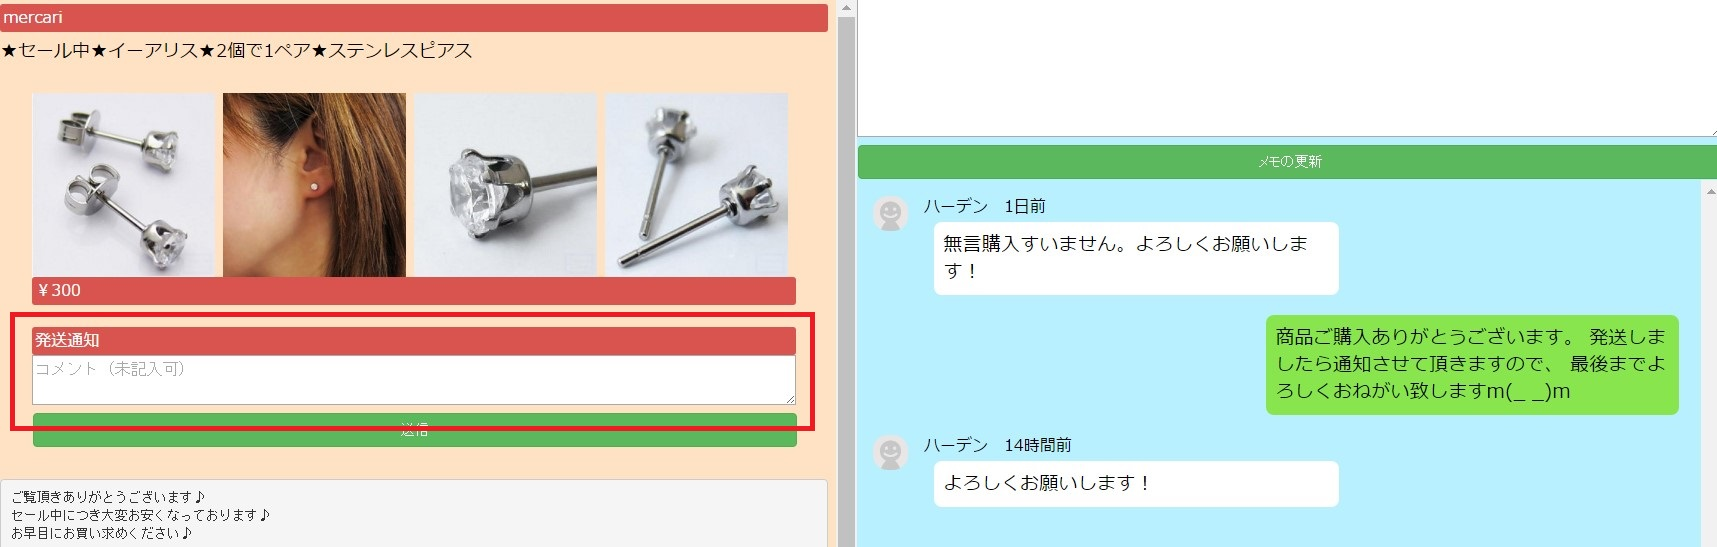 SnapCrab_NoName_2017-2-6_11-41-16_No-00